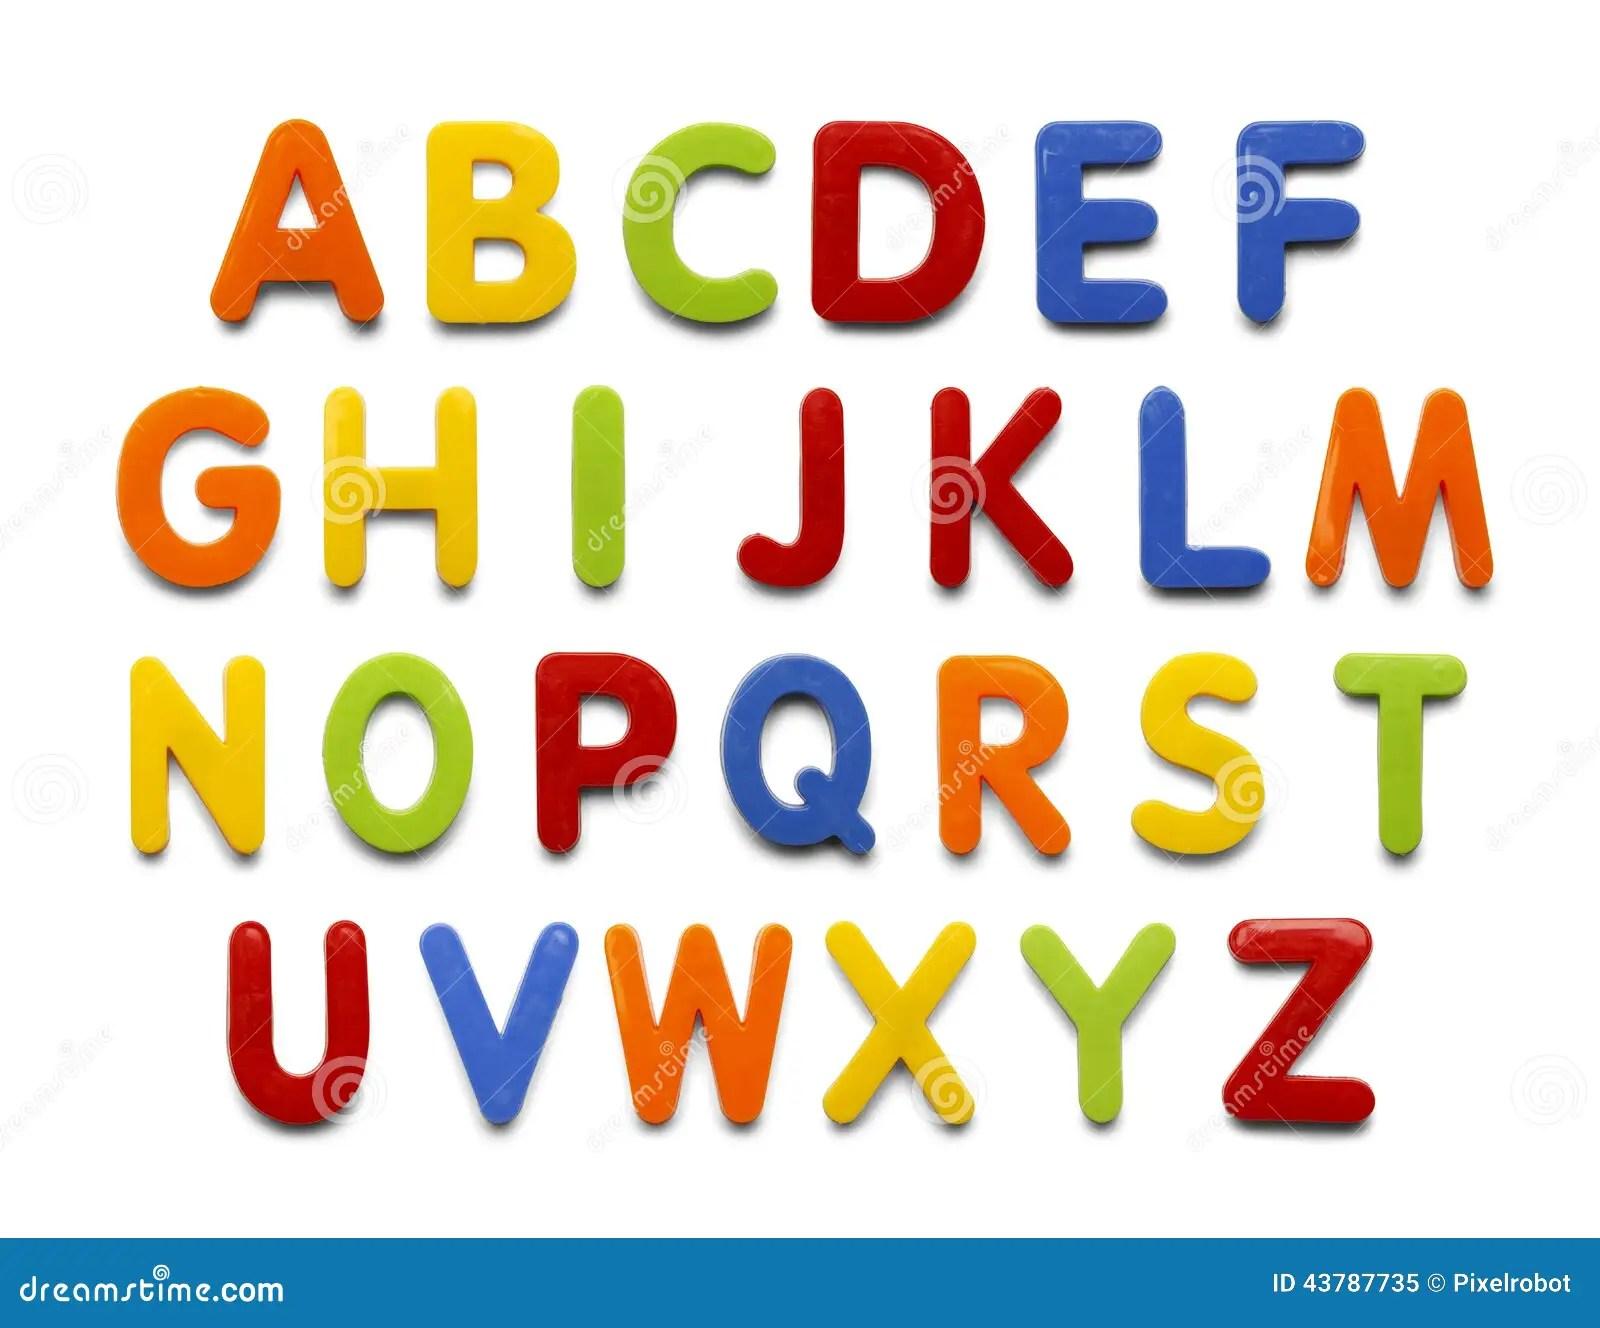 Magnet Alphabet Stock Image Image Of Objects Back